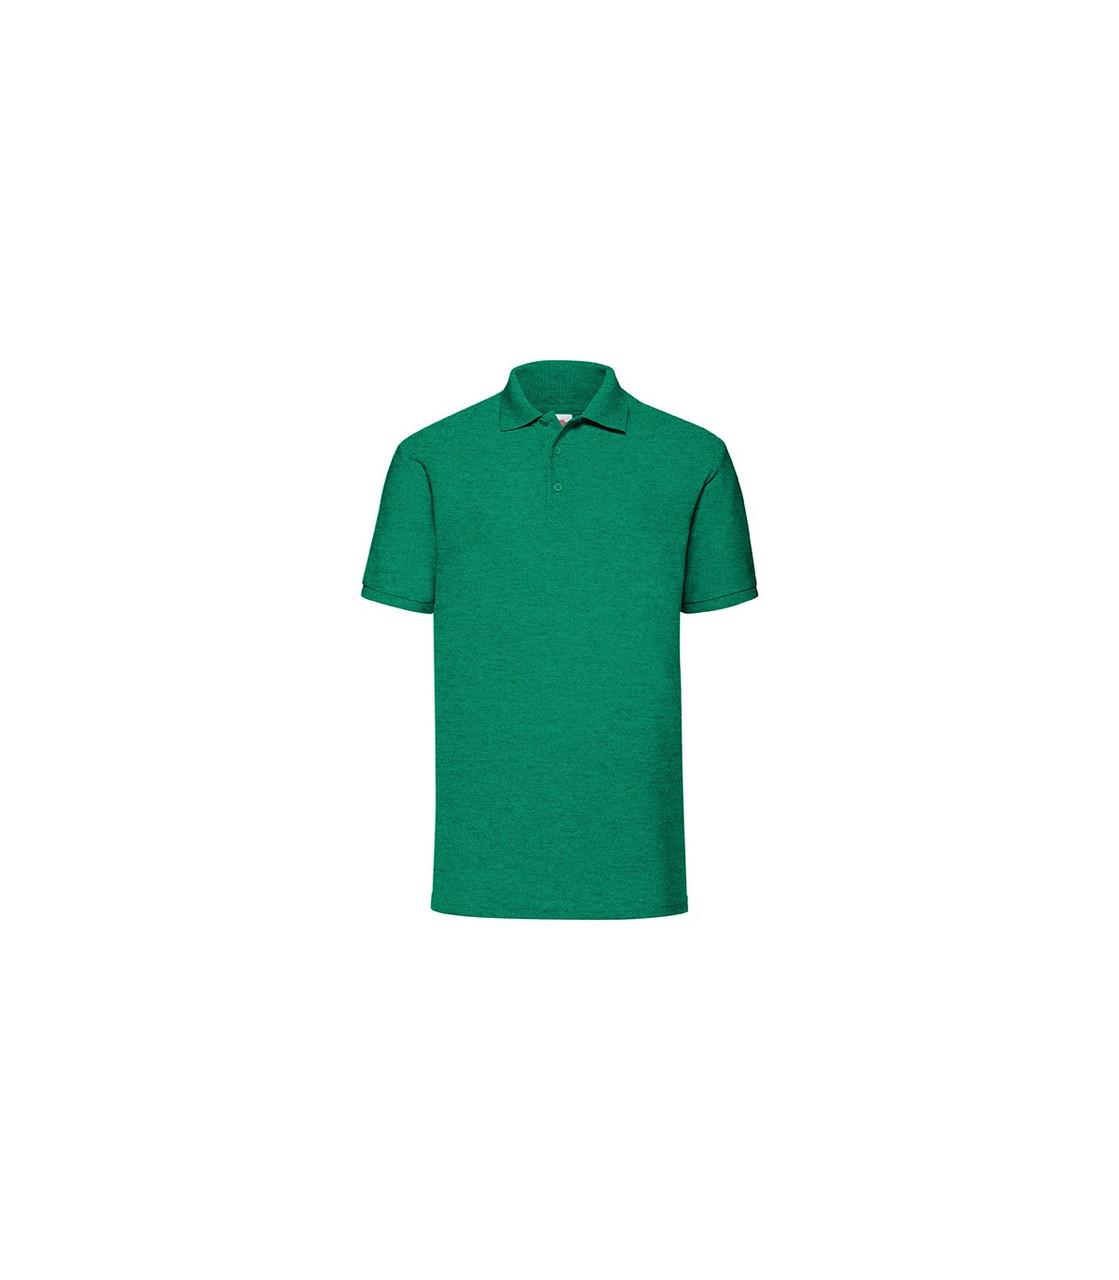 Мужская футболка поло зеленая меланж 402-RX